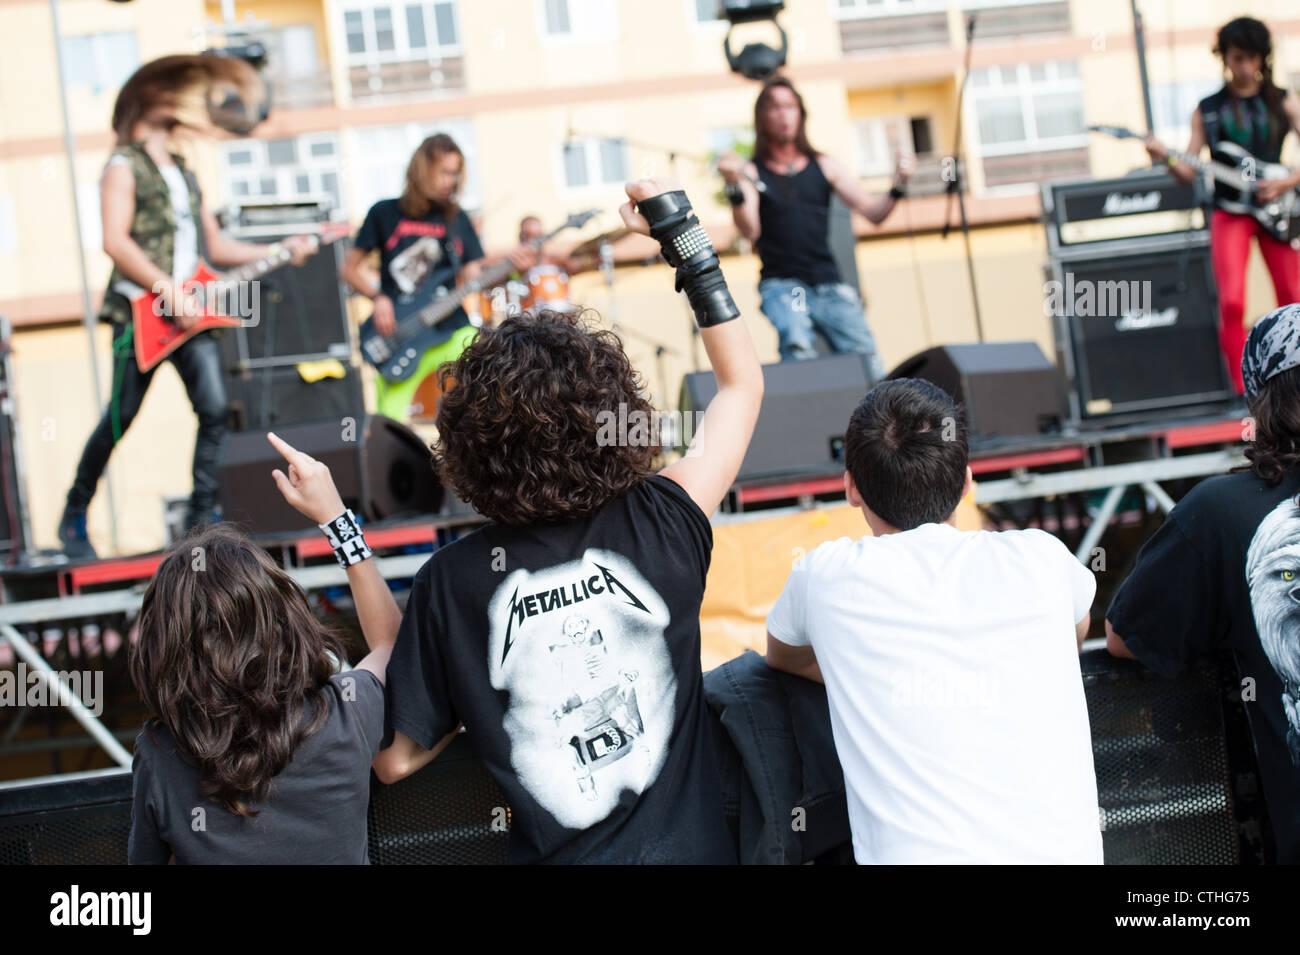 Metrabate performs during Cebollinazo Rock - Stock Image